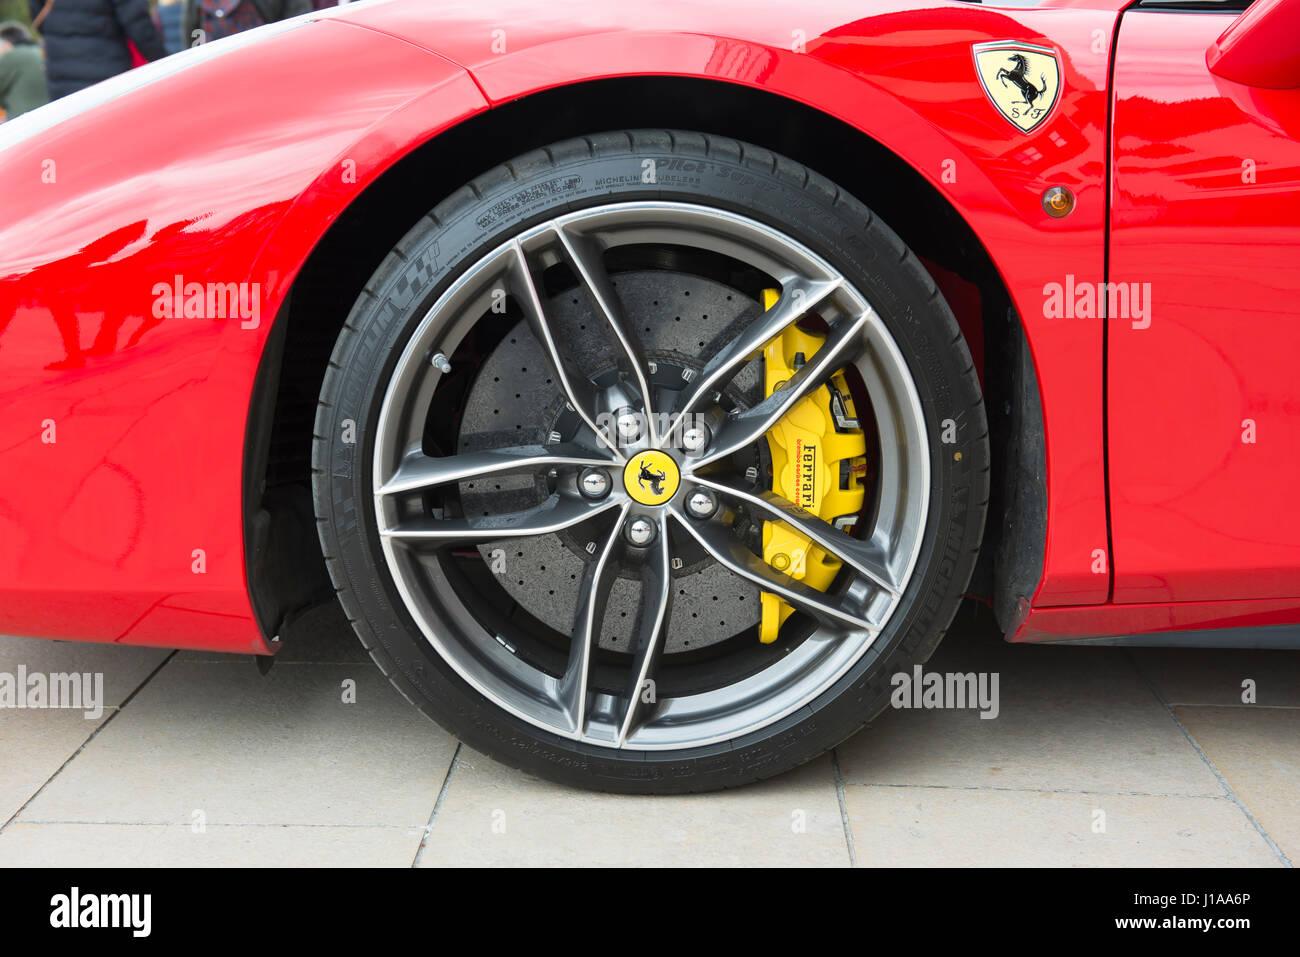 Alloy Front Wheel Of Ferrari 488 Spider Showing Brembo Carbon Ceramic Stock Photo Alamy